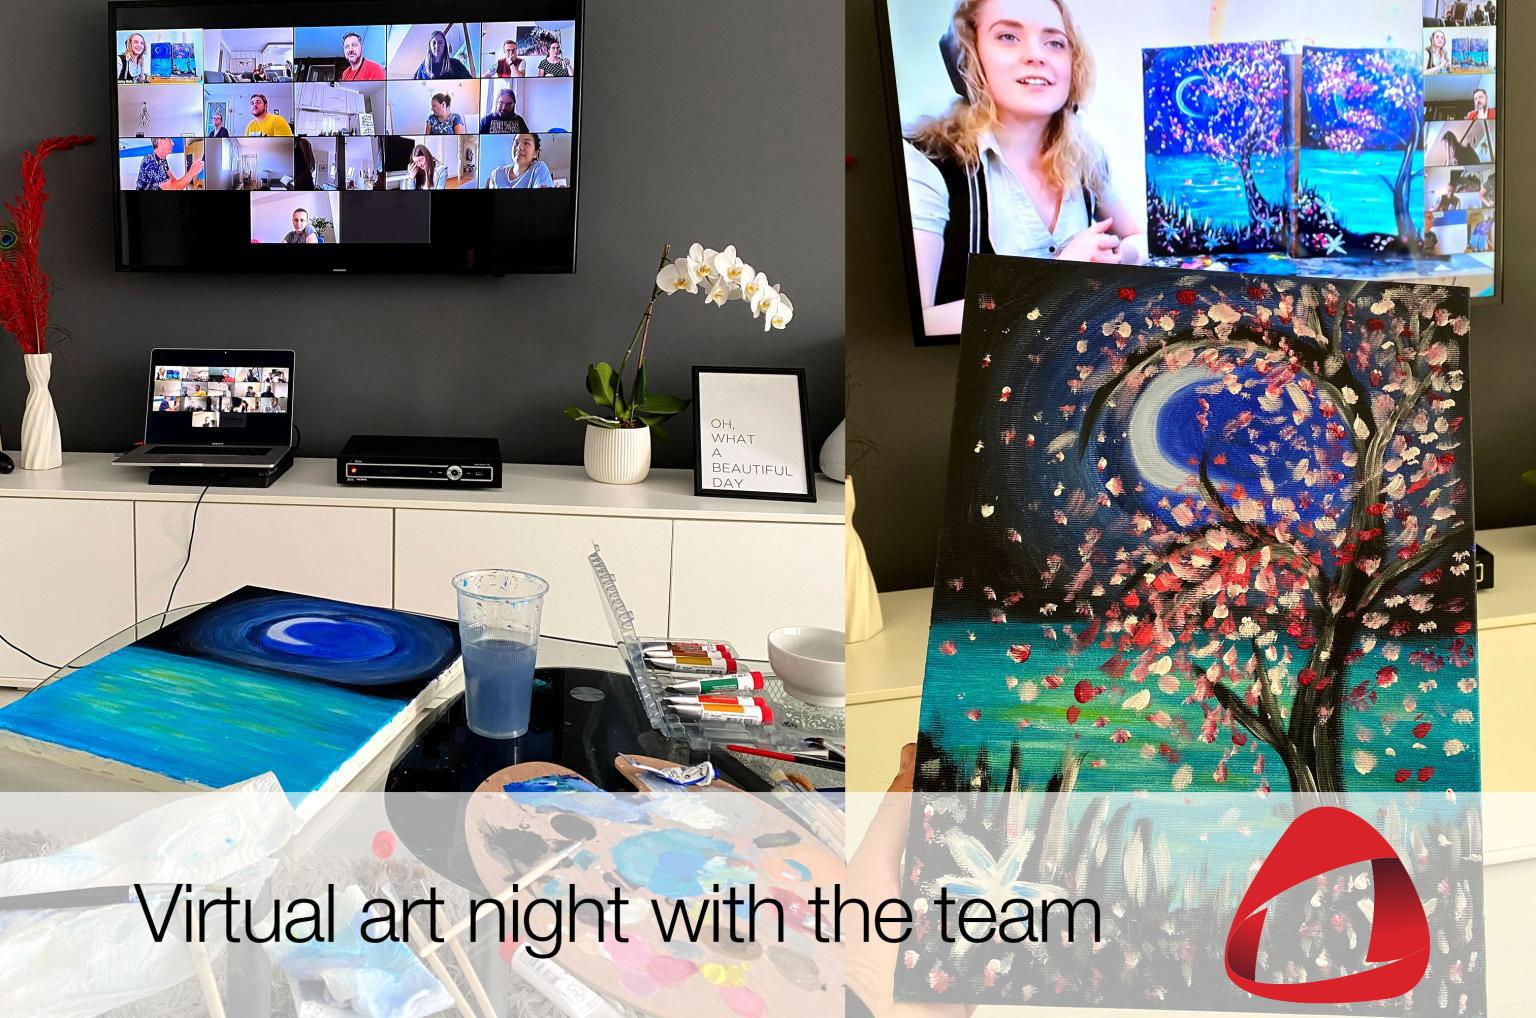 Virtual art night with the team